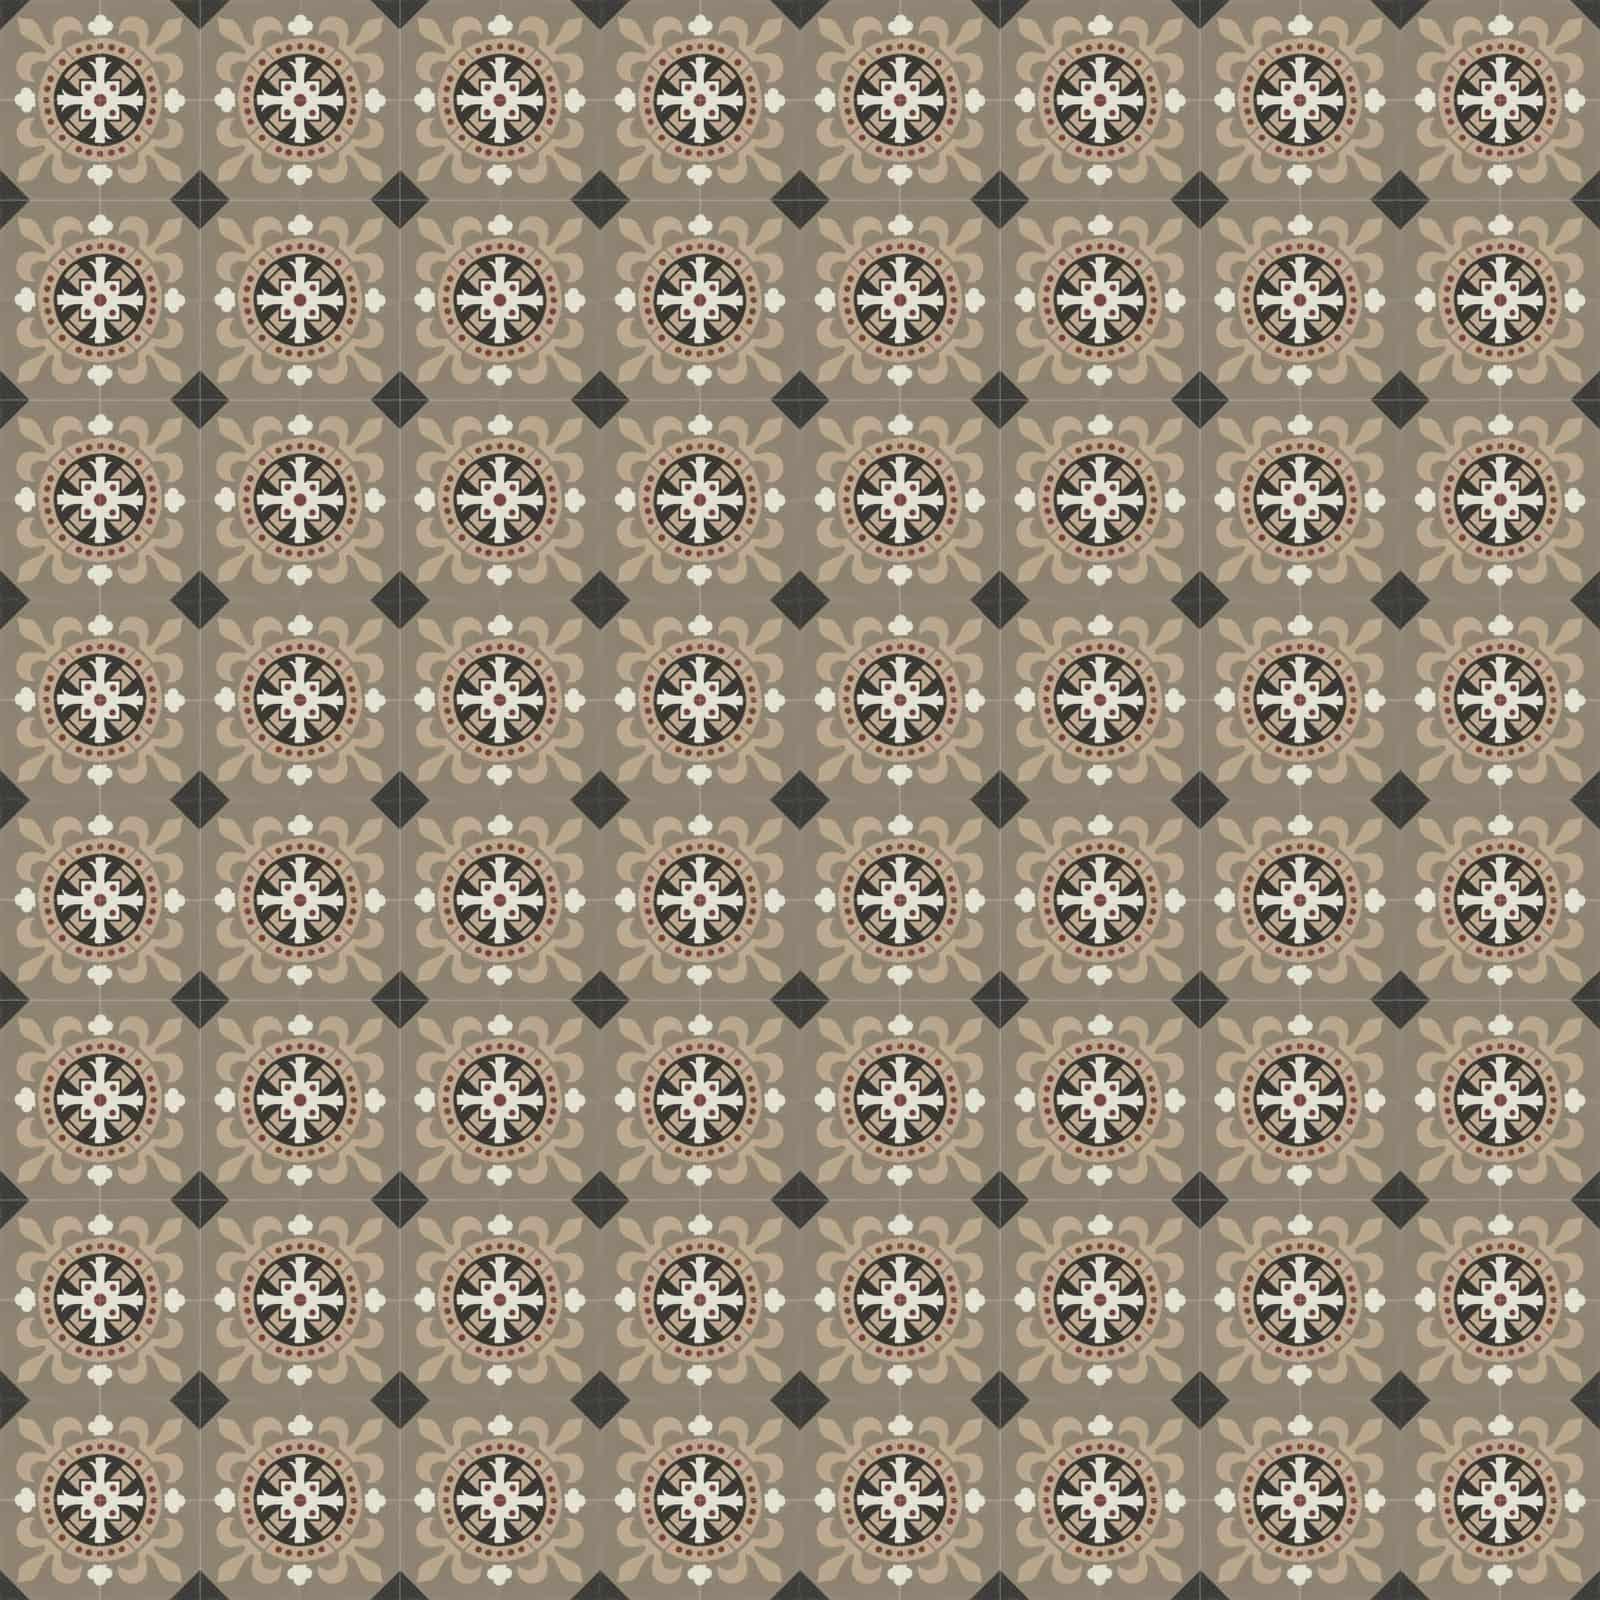 zementfliesen-verlegemuster-nummer-51166_170-ohne-rand-viaplatten | N° 51166/170